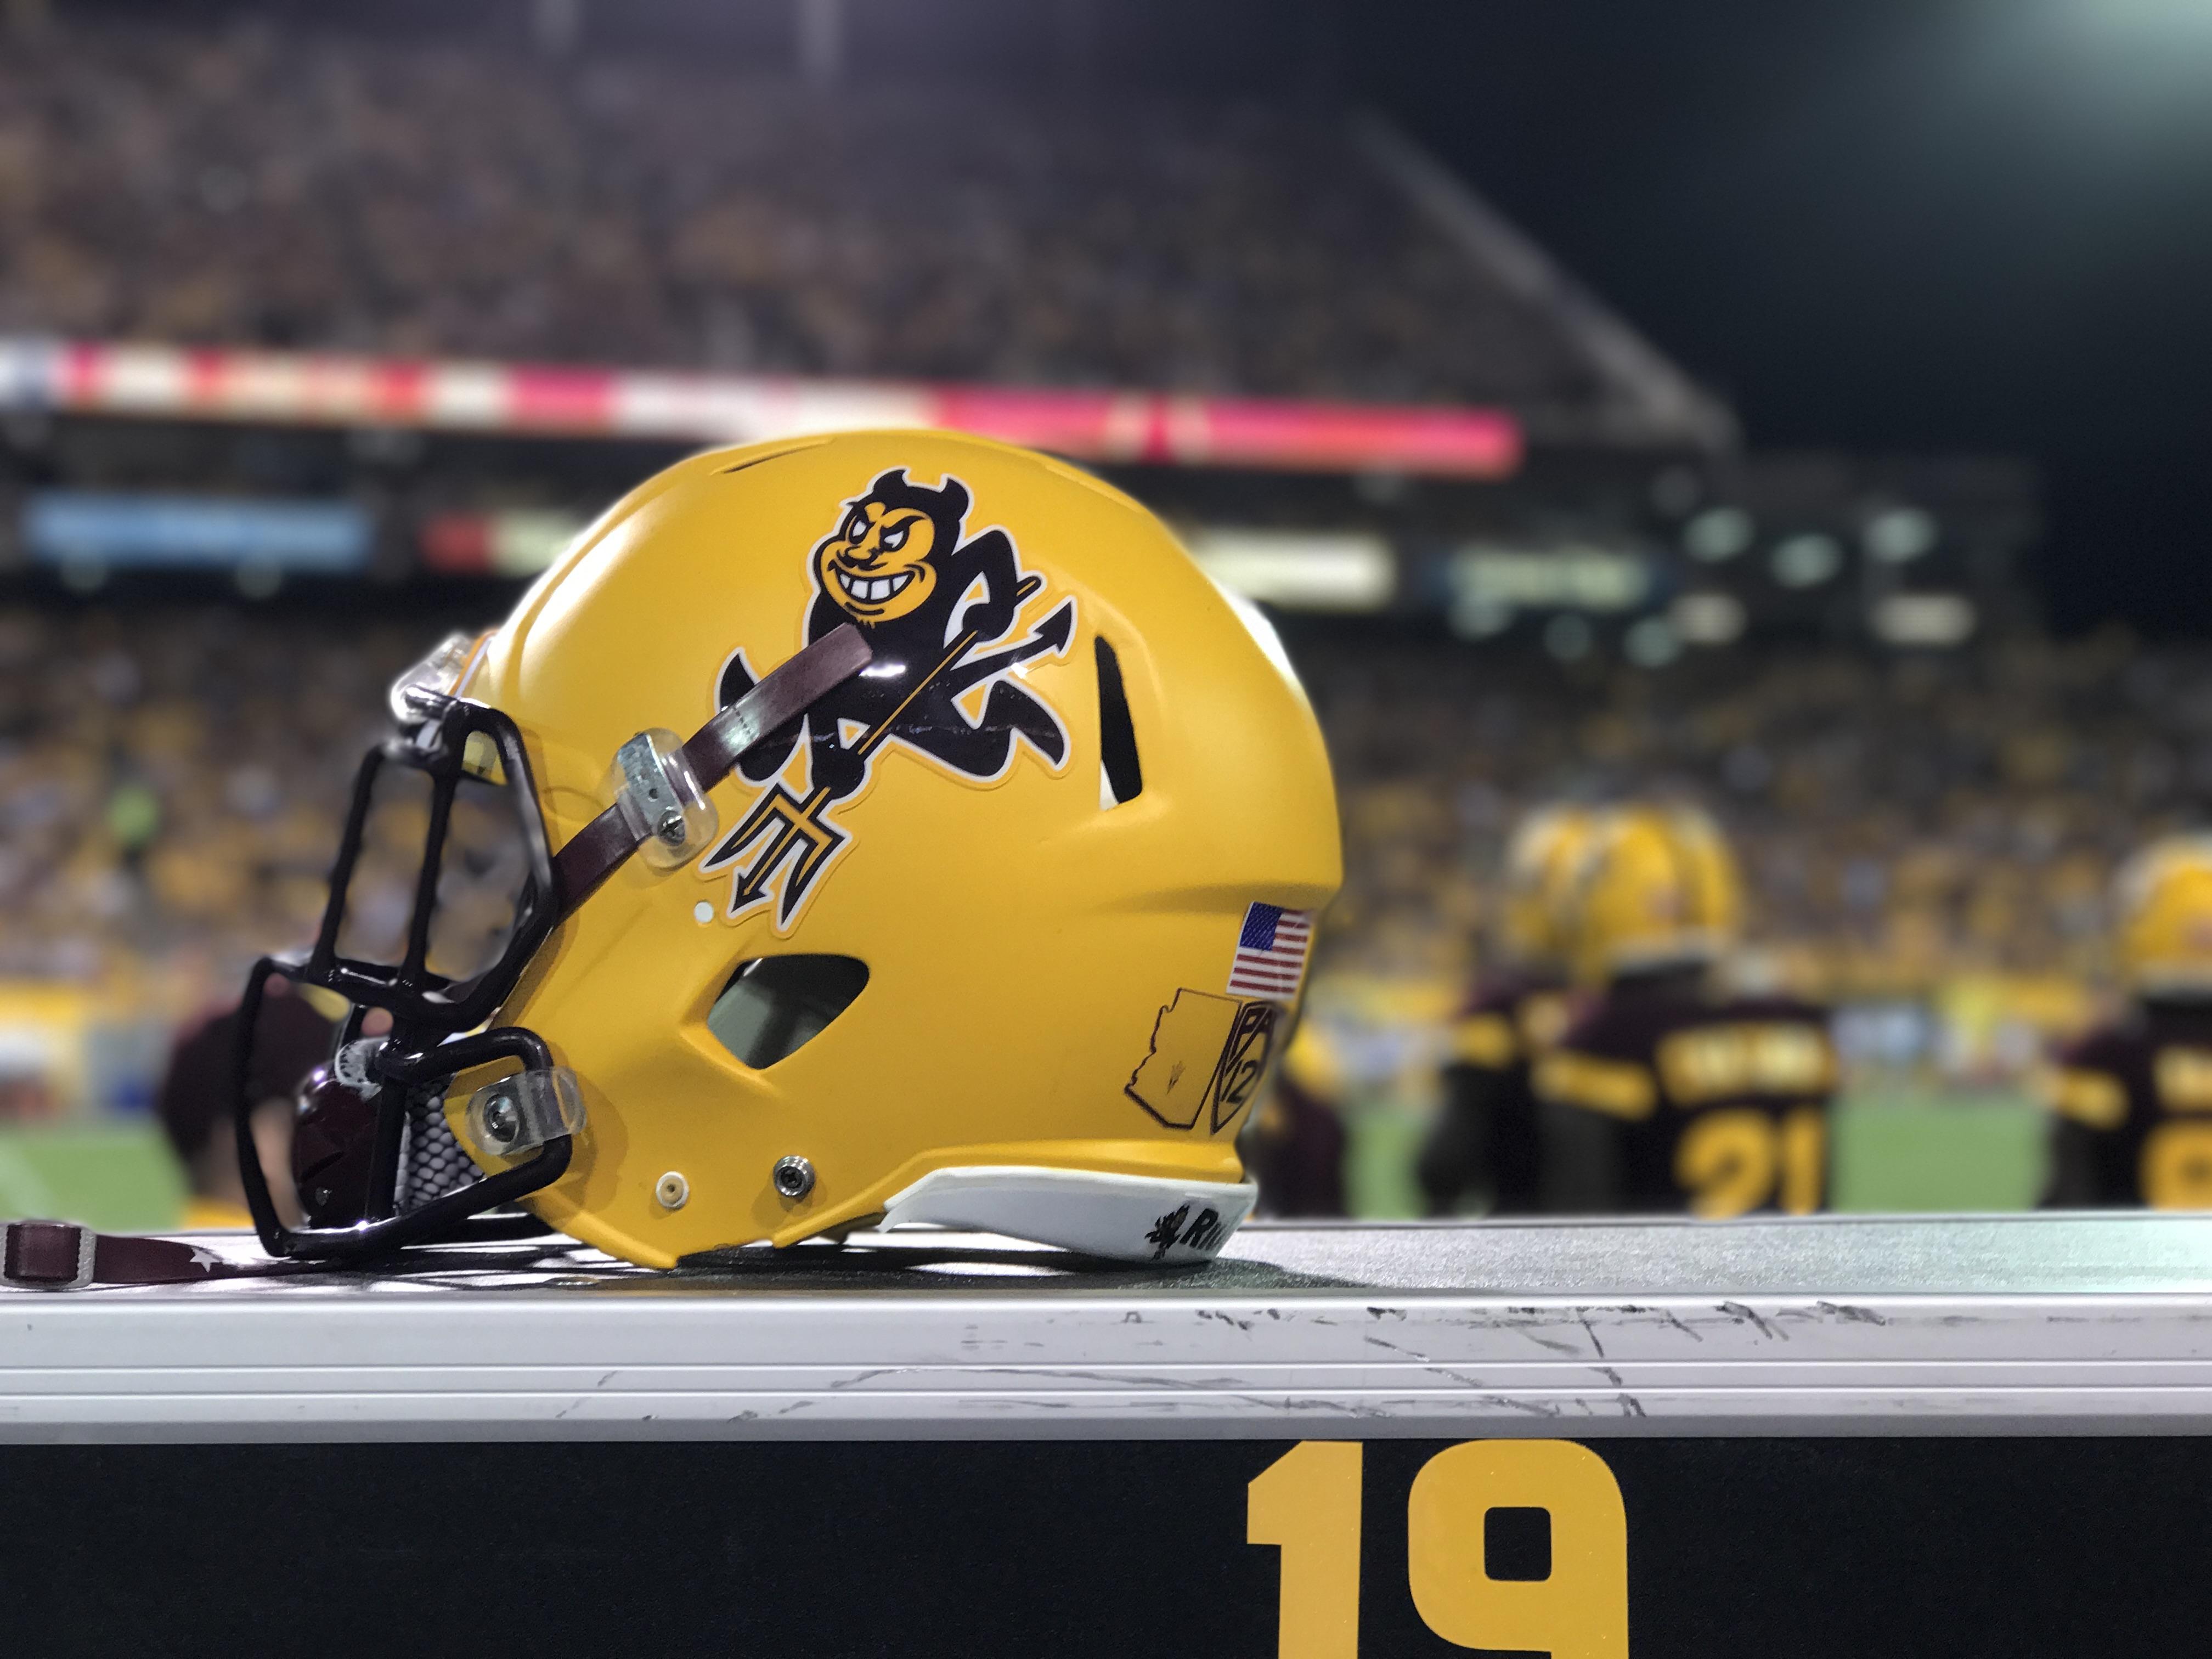 ASU homecoming game helmet vs WSU